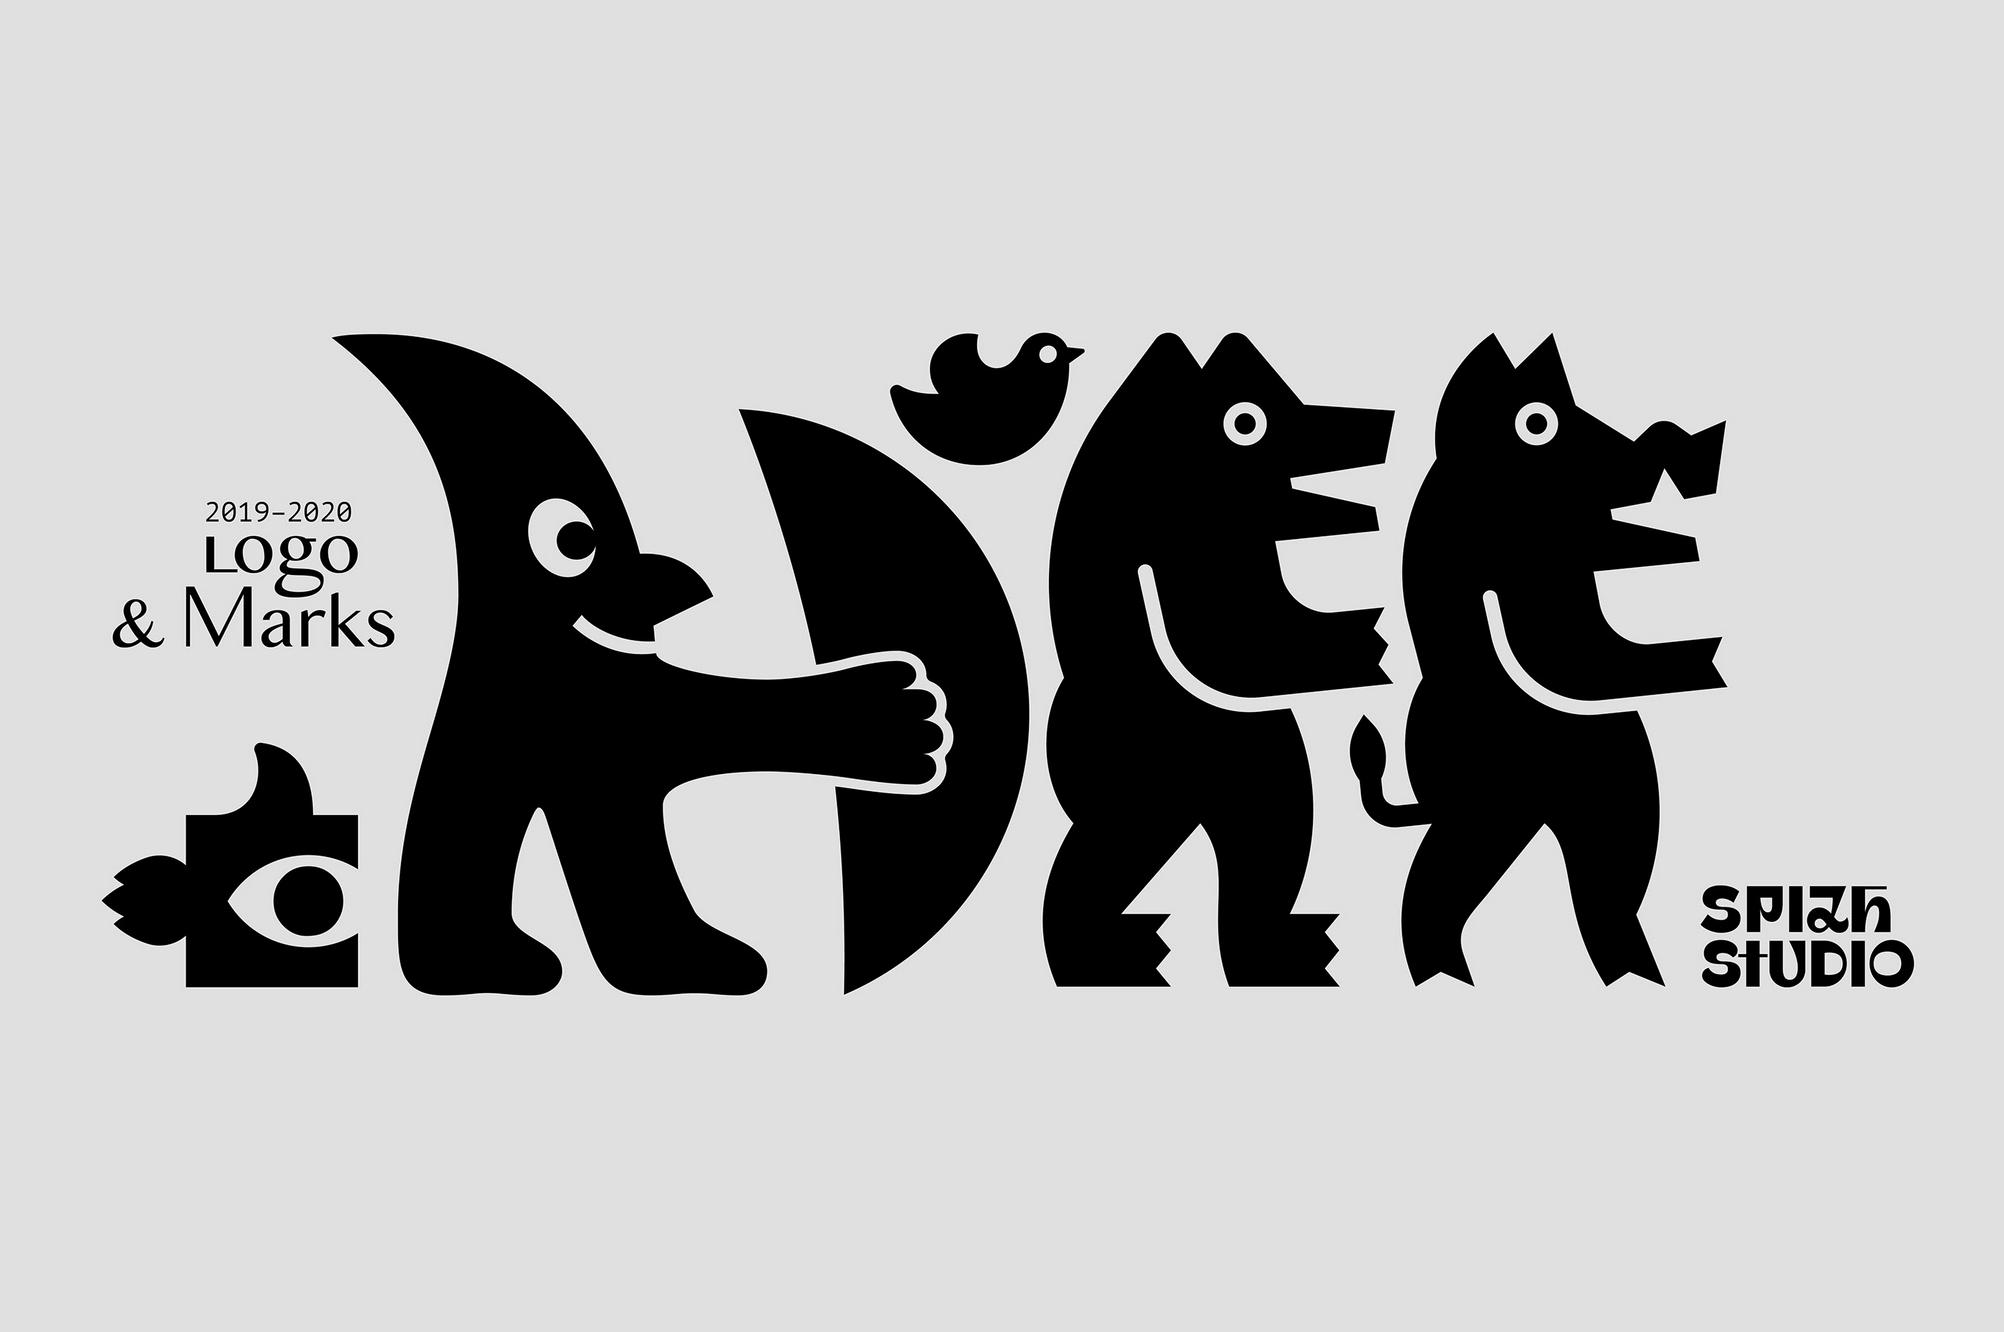 Very fun logo branding. Zhenya Spizh - Logos & Marks